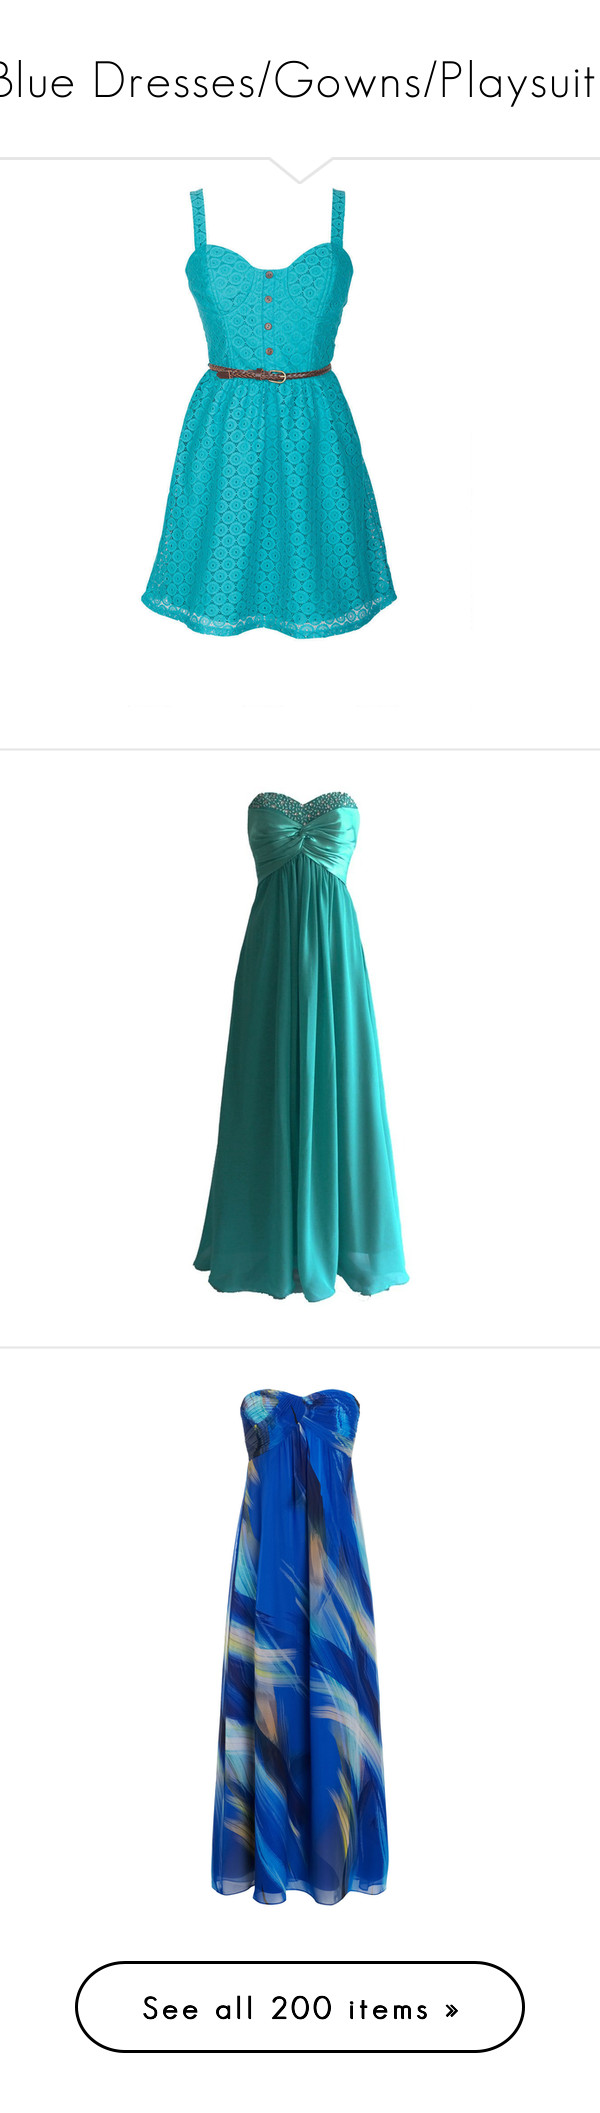 Blue Dresses/Gowns/Playsuits\